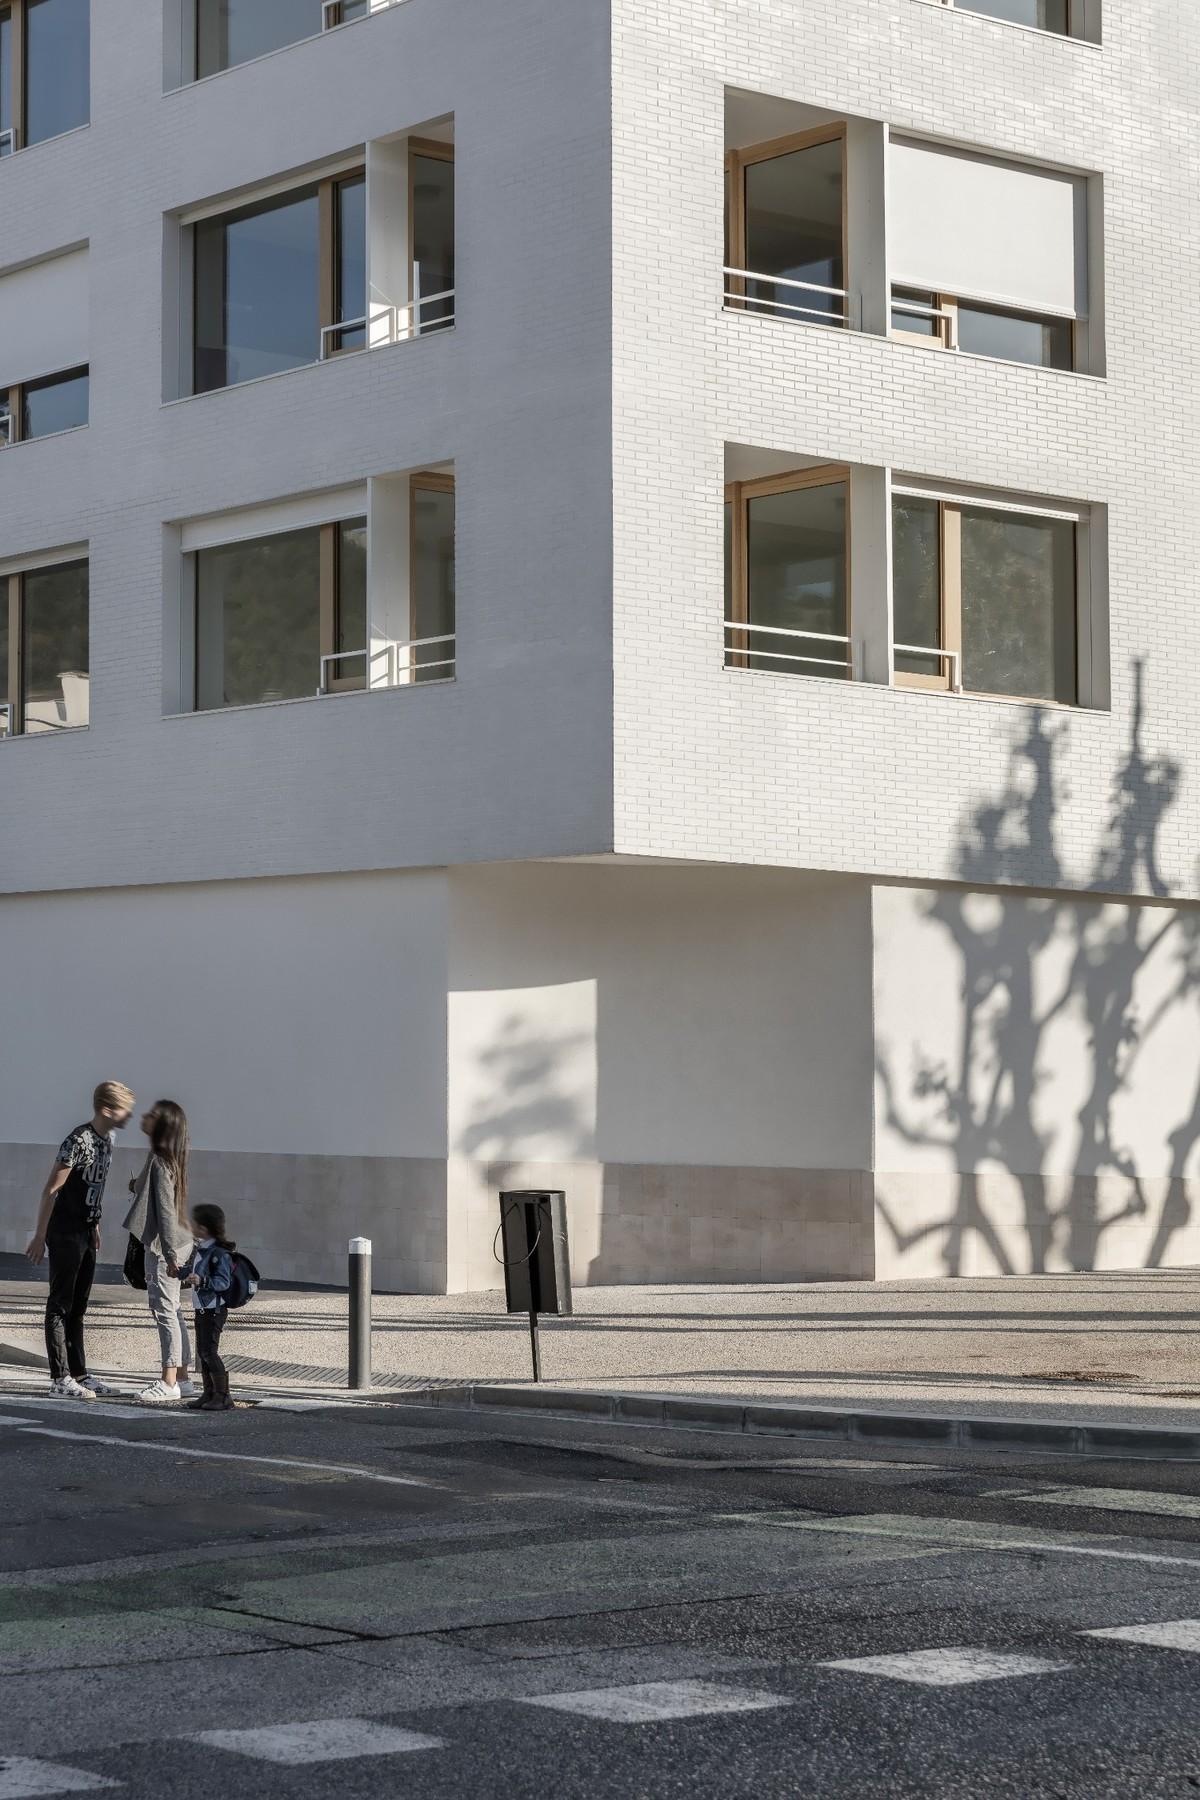 Housing Montfleuri. Design by Fernandez & Serres. PhPhoto courtesy of Aldo Amoretti.